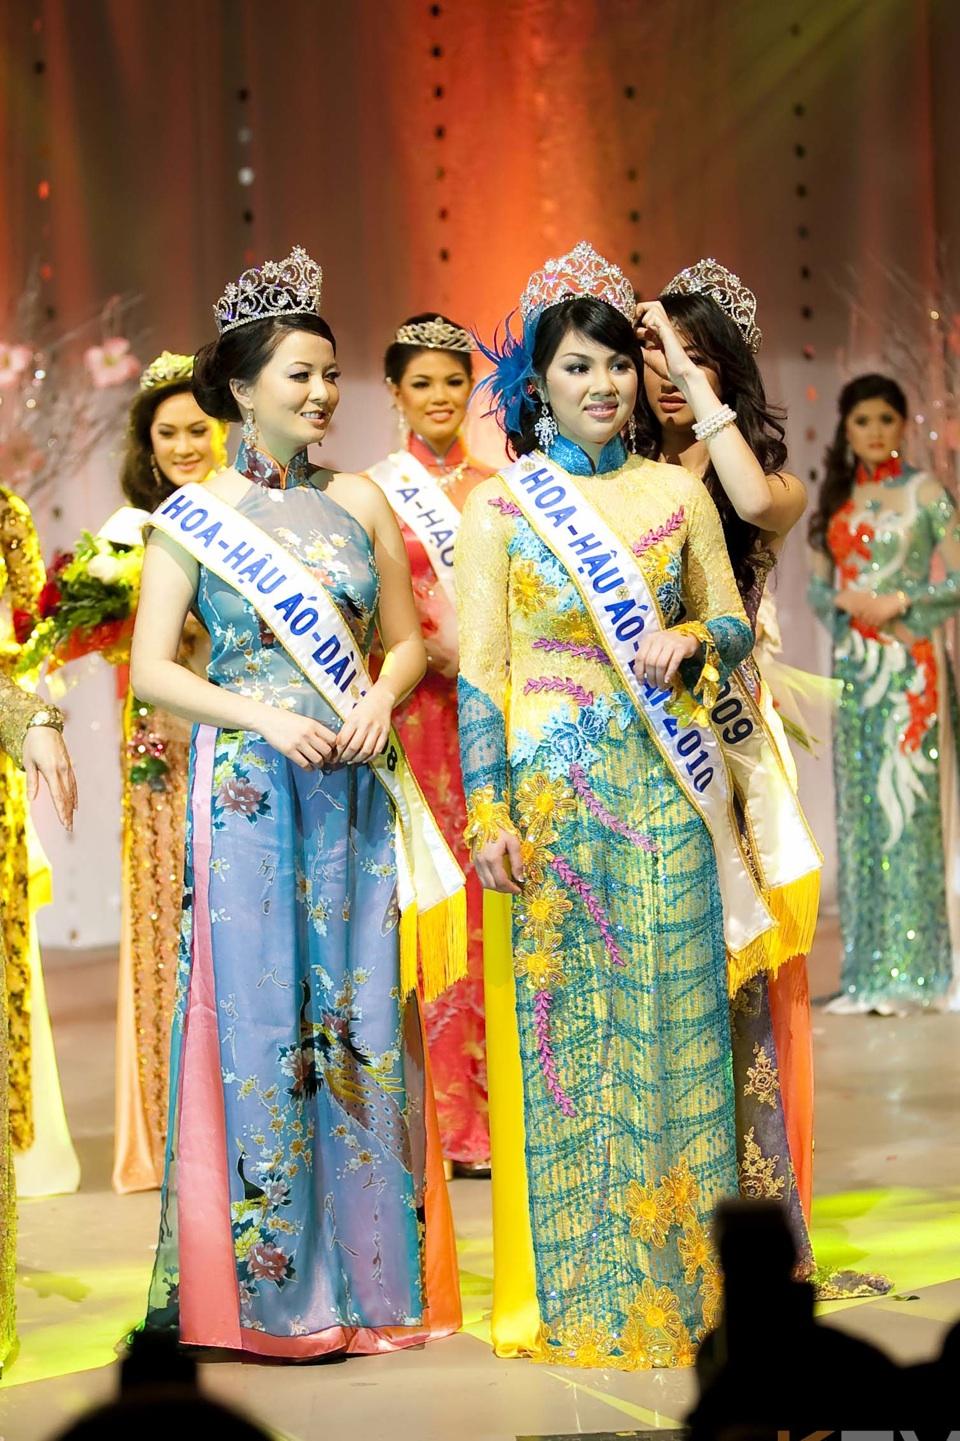 Miss Vietnam - Hoa Hau Ao Dai Bac Cali 2010 - Pageant Day - Image 128